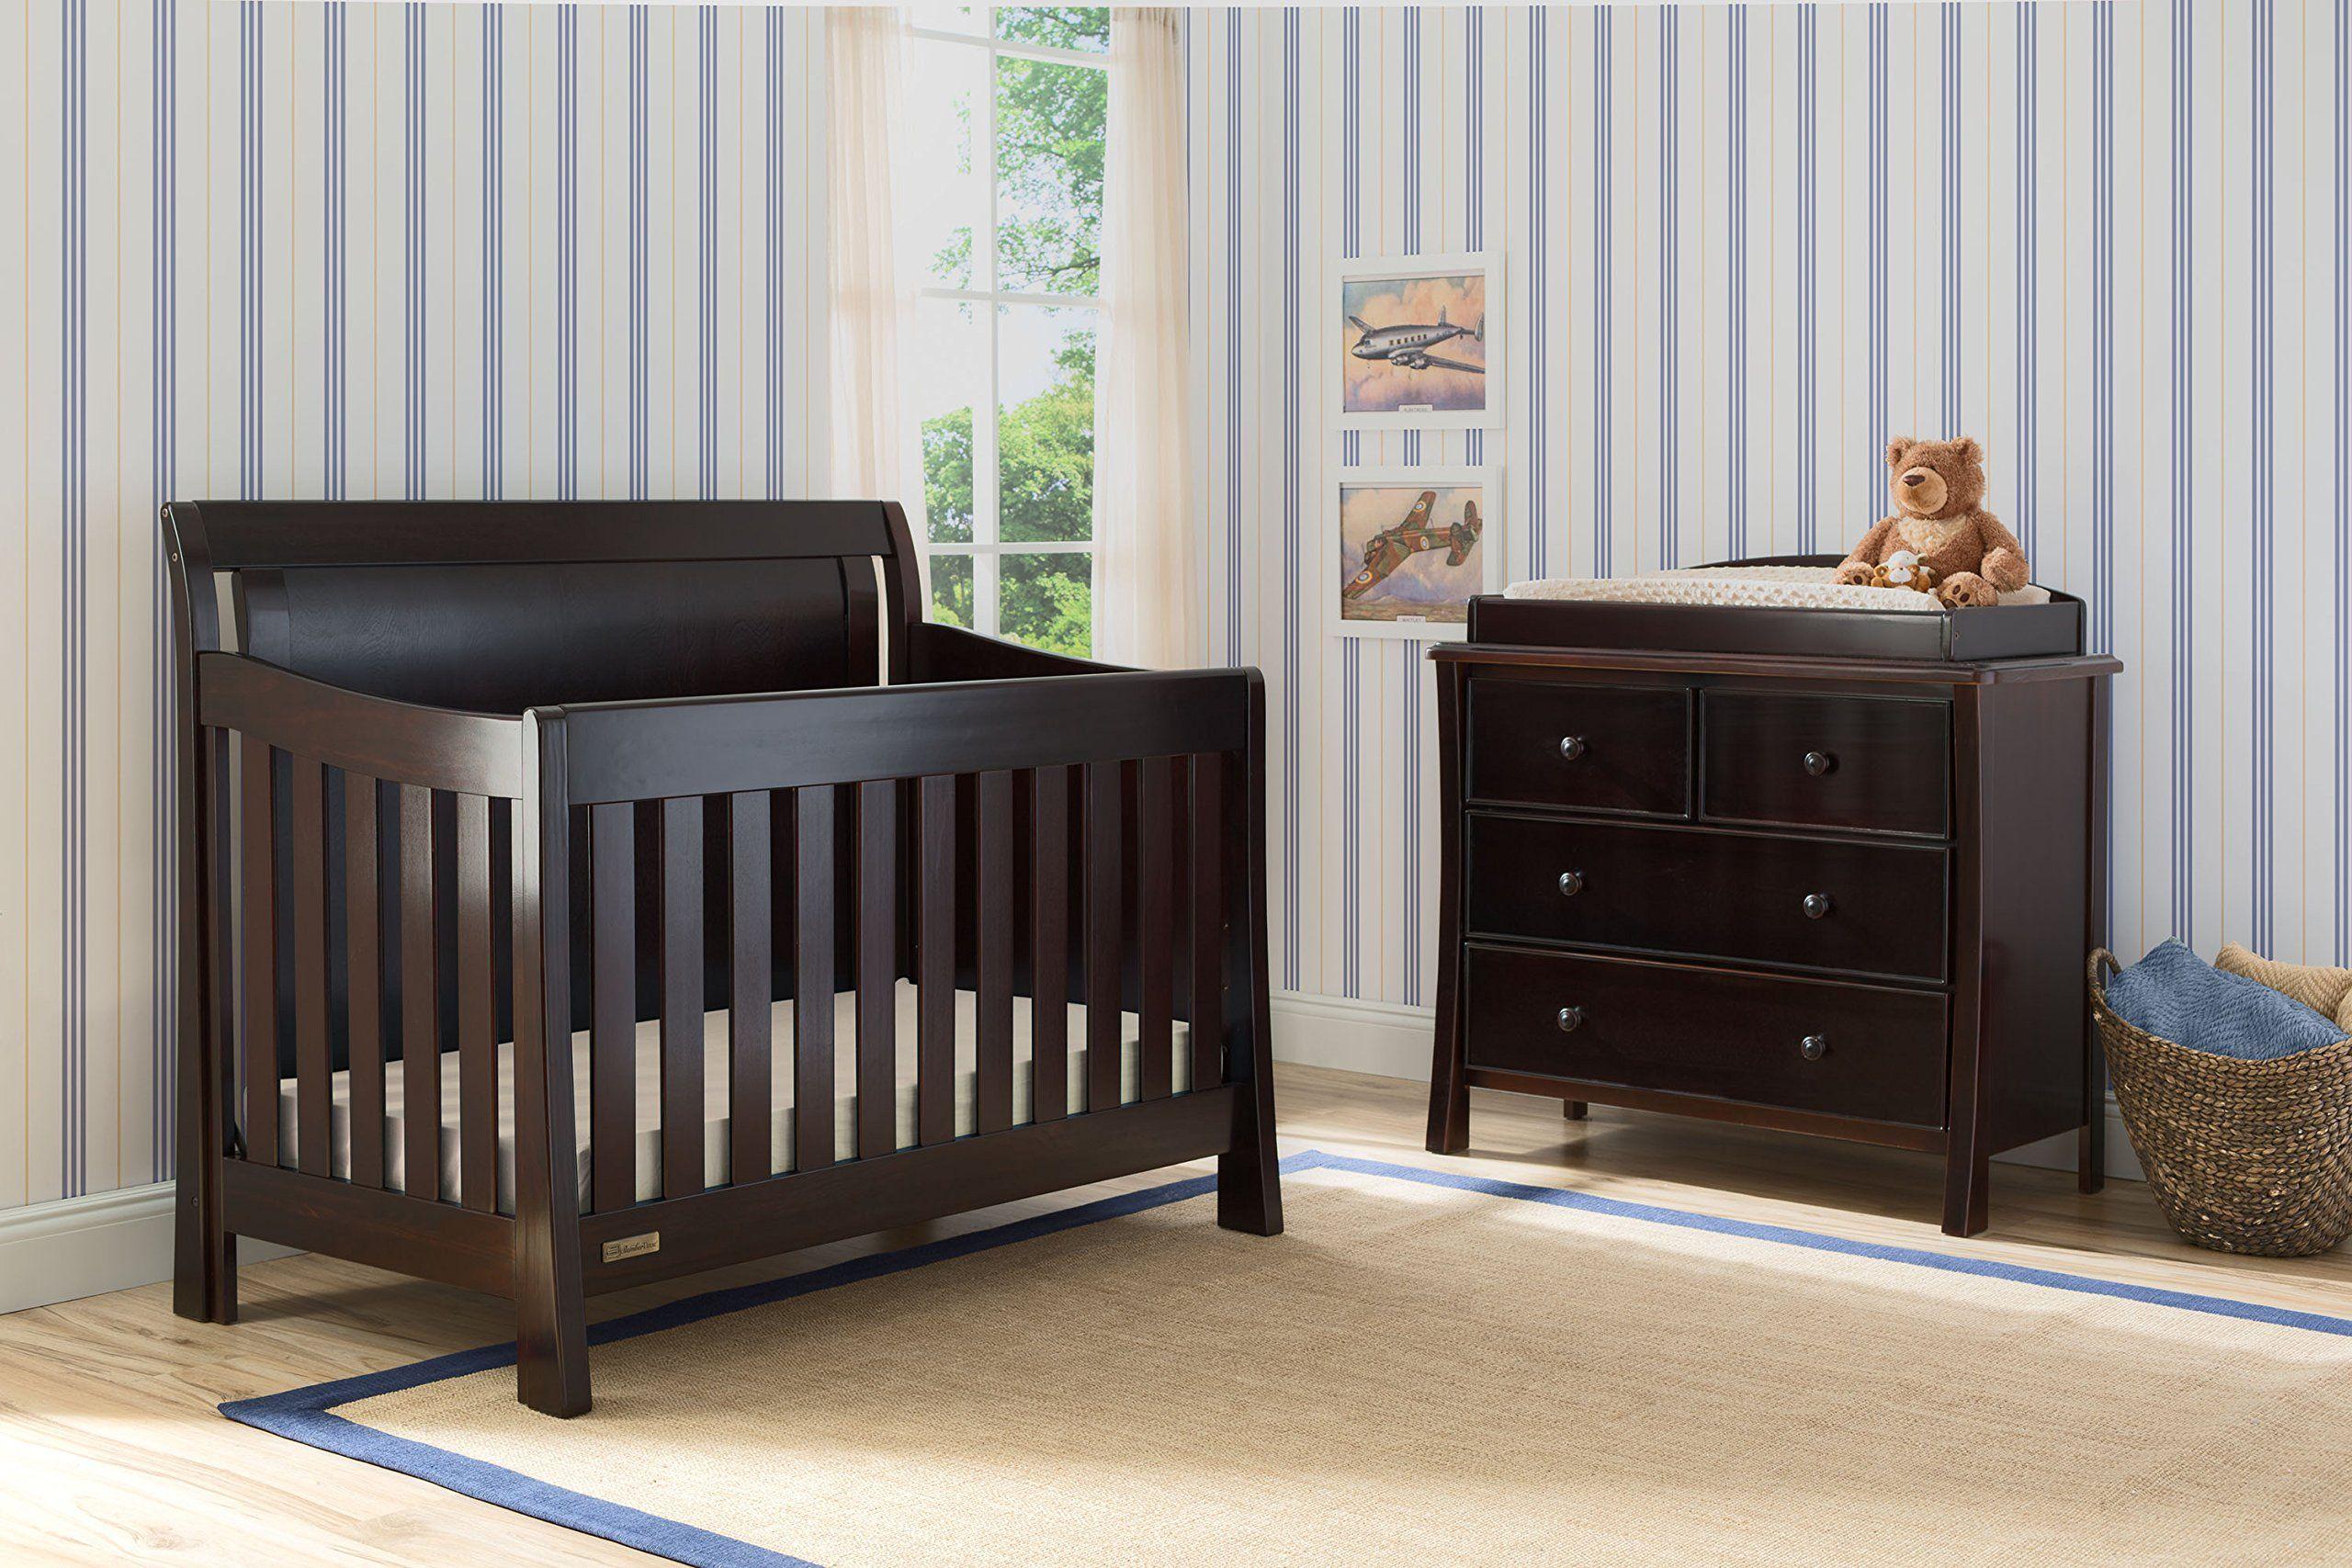 Simmons Kids Broadway 5piece Black Espresso Nursery Furniture Set